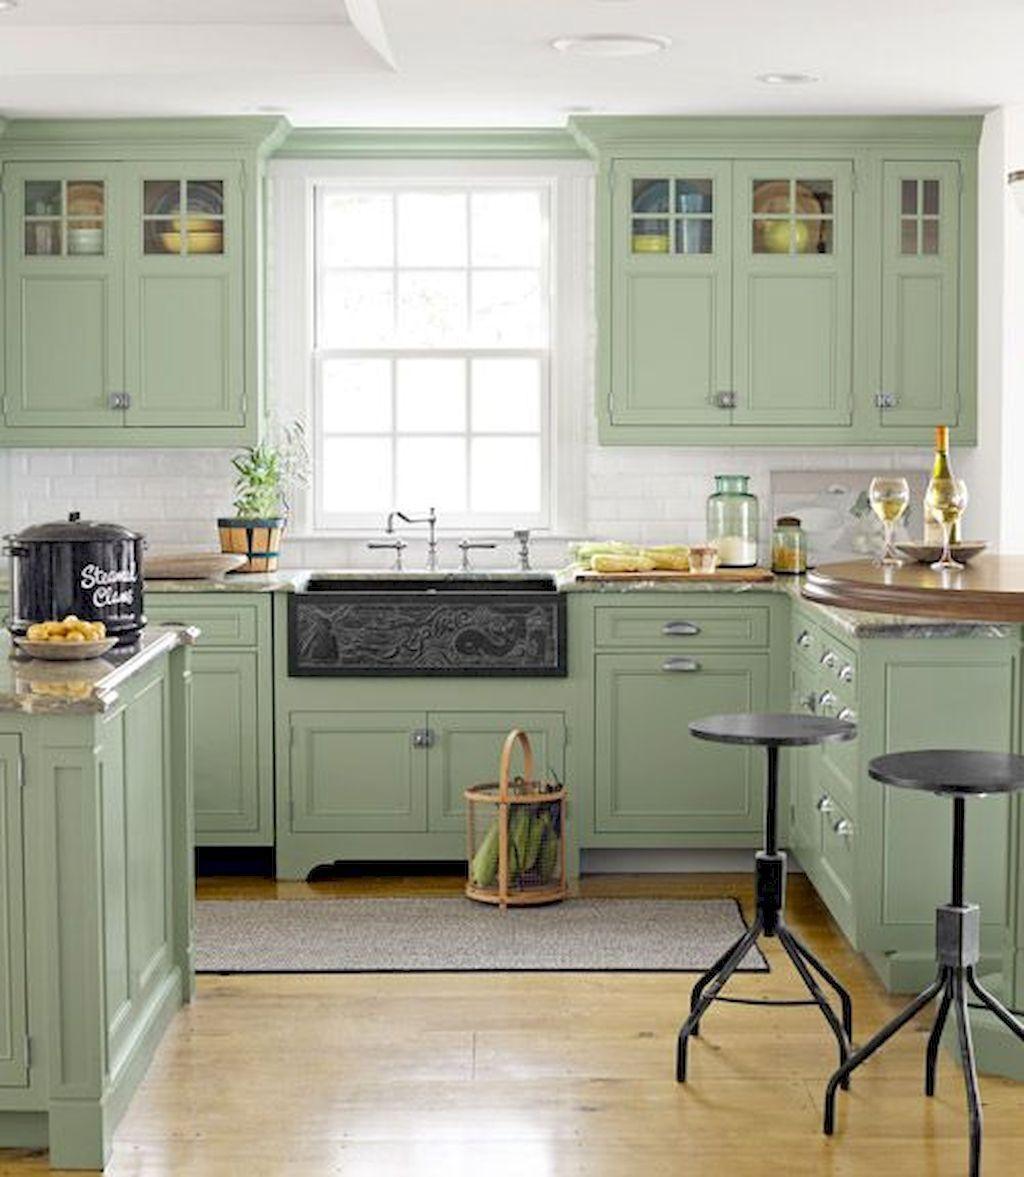 Best composition fresh color kitchen cabinet decor ideas in